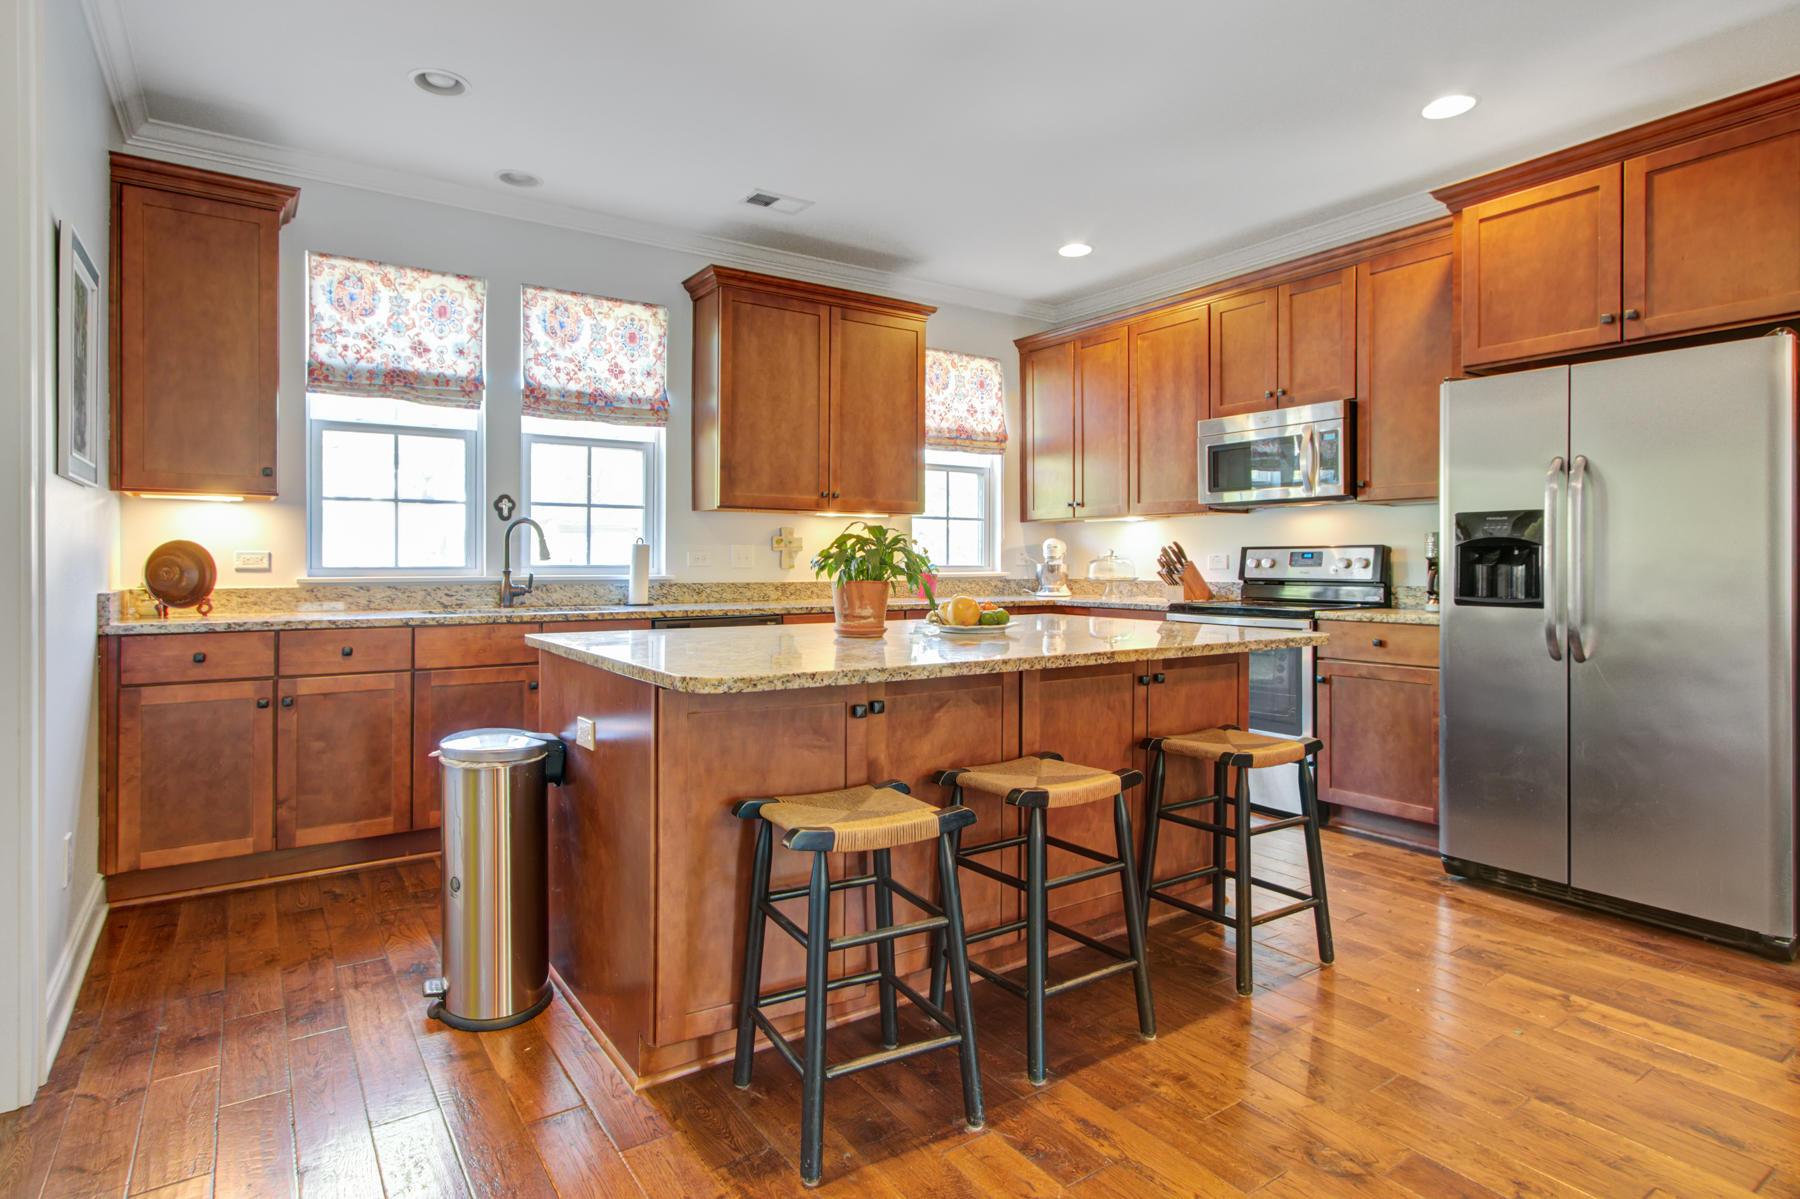 Etiwan Pointe Homes For Sale - 254 Slipper Shell, Mount Pleasant, SC - 15